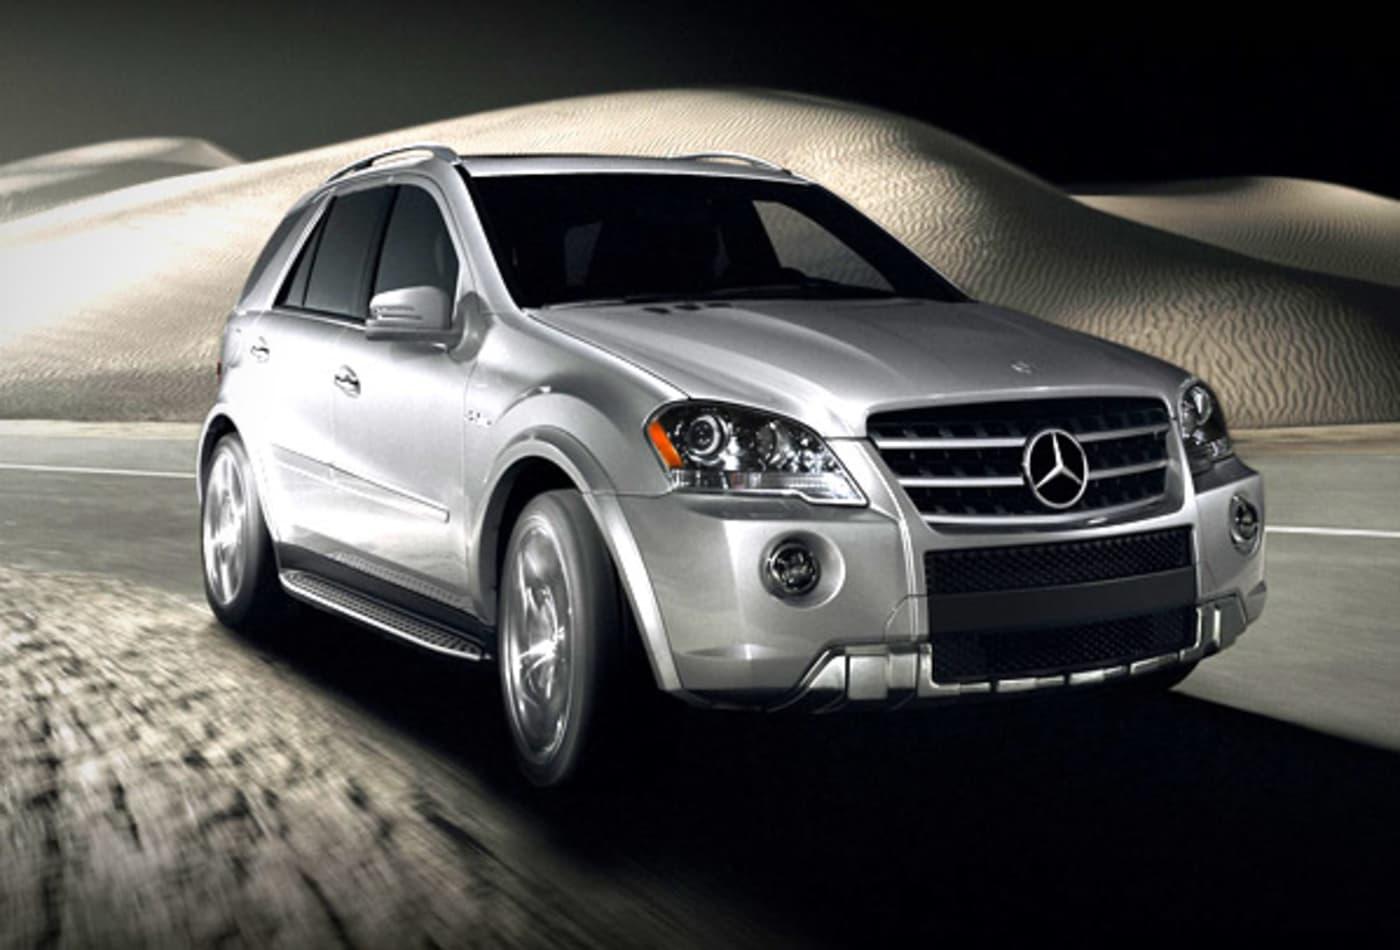 SS_Biggest_Gas_Guzzlers_Mercedes_AMG.jpg